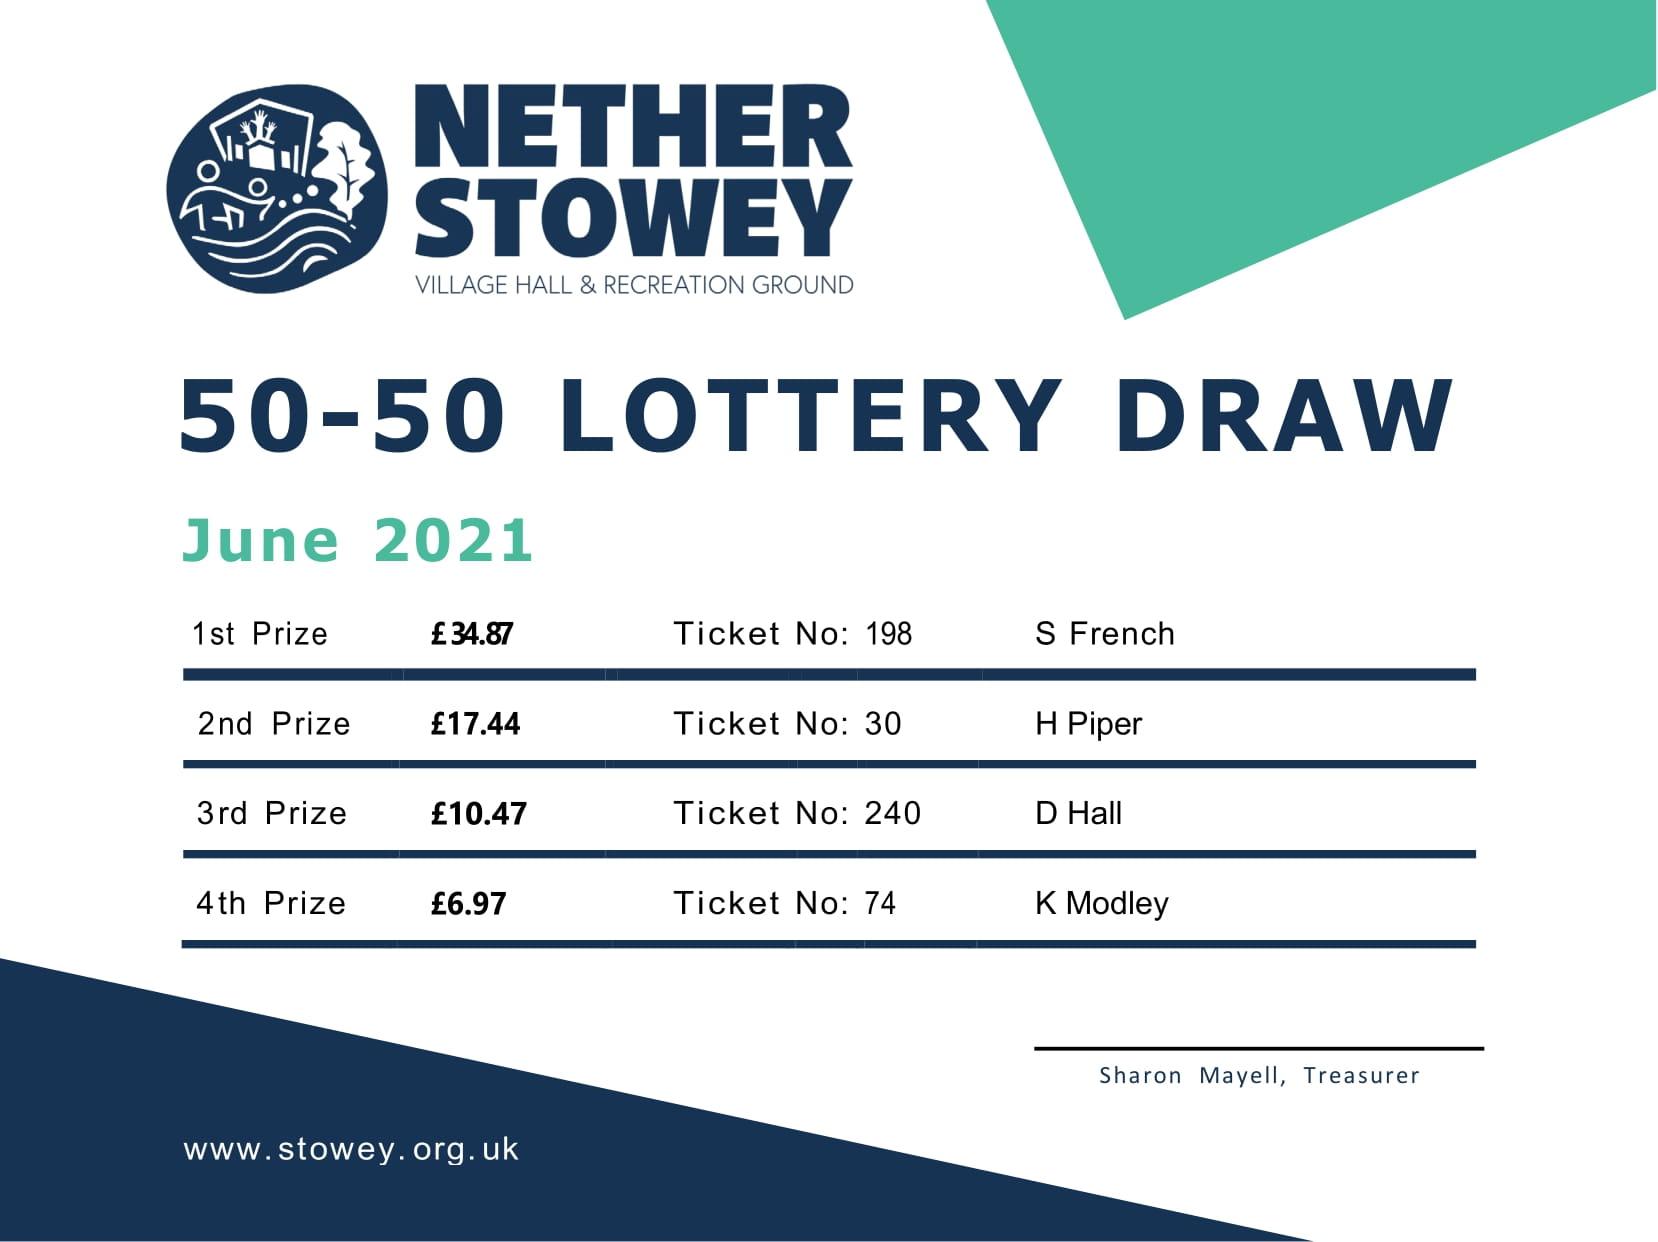 Nether Stowey 50-50 Lottery June 2021